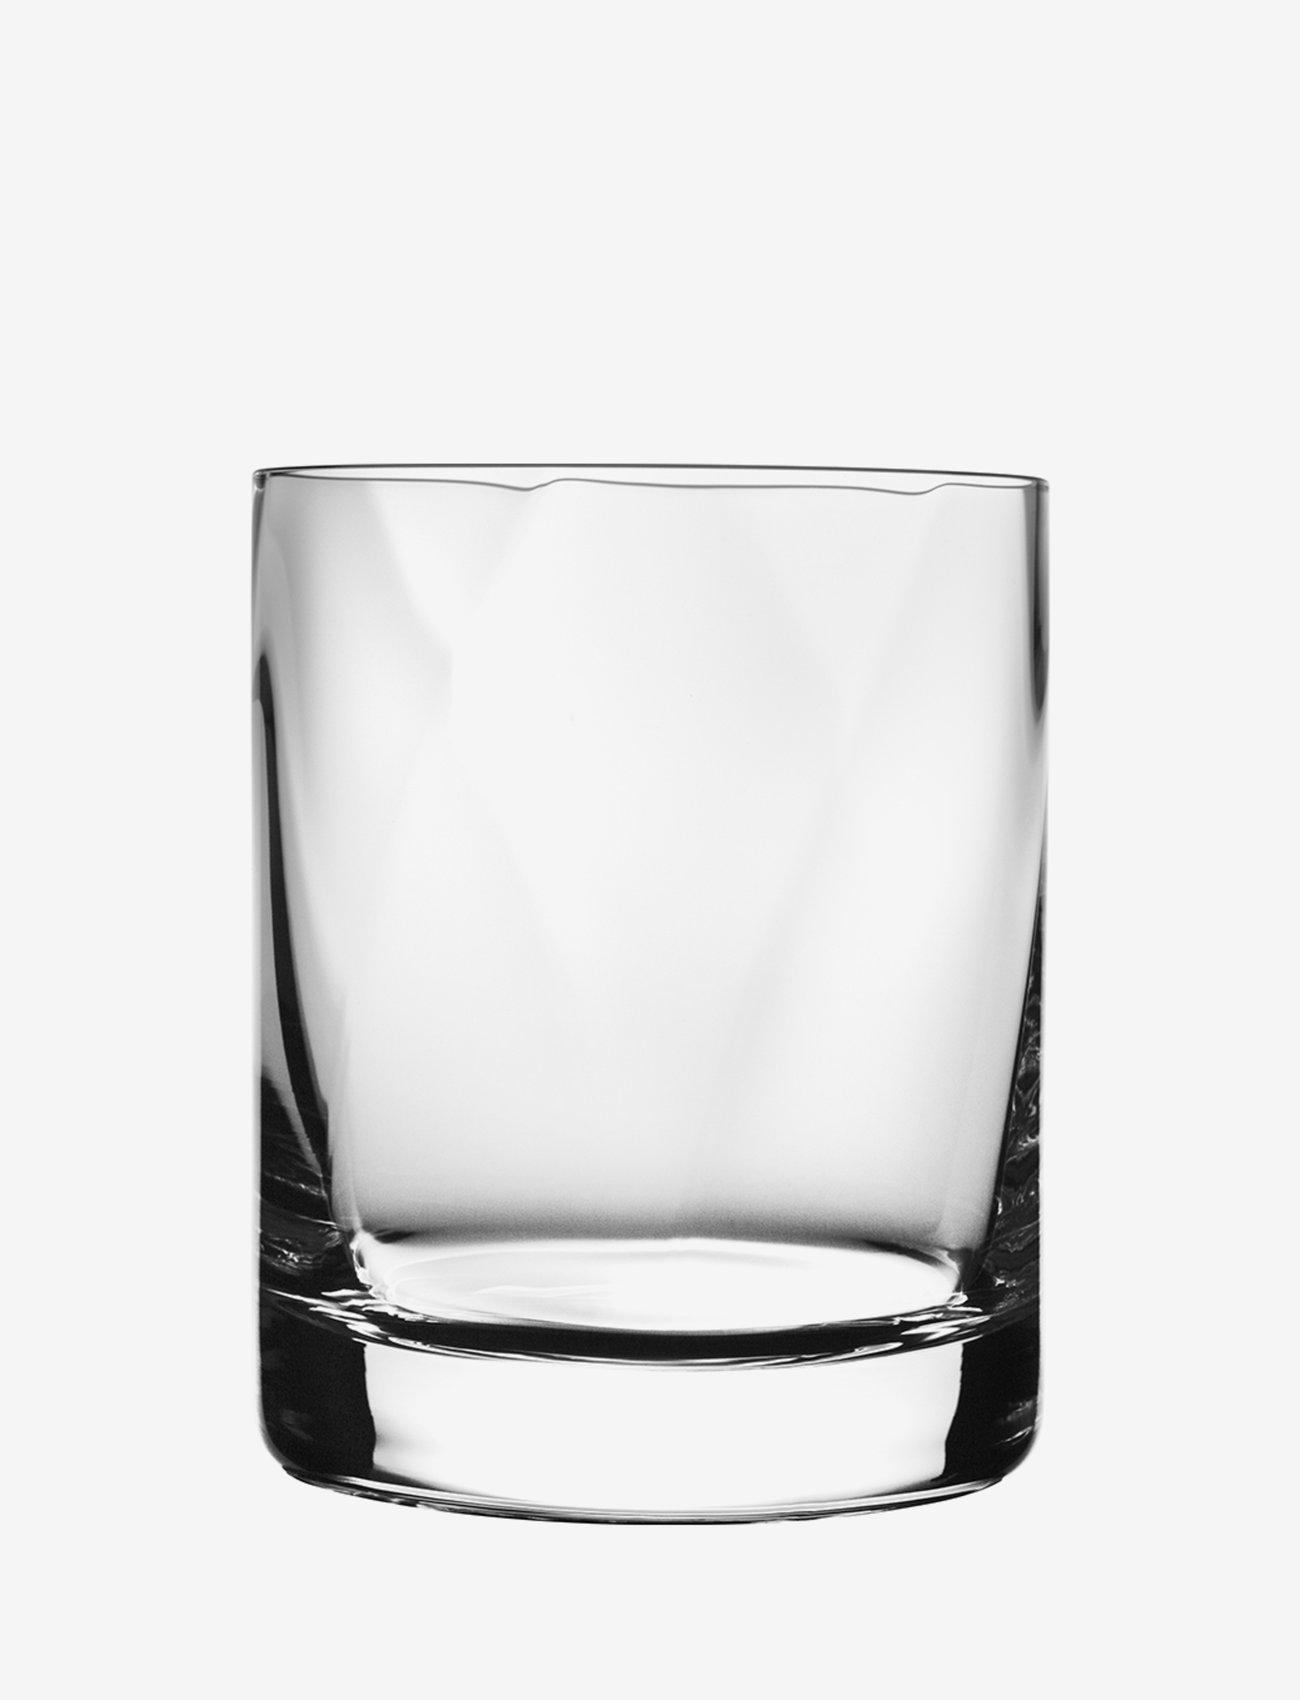 Kosta Boda - CHATEAU TUMBLER 27 CL (20CL) - whiskyglass & cognacglass - clear - 0